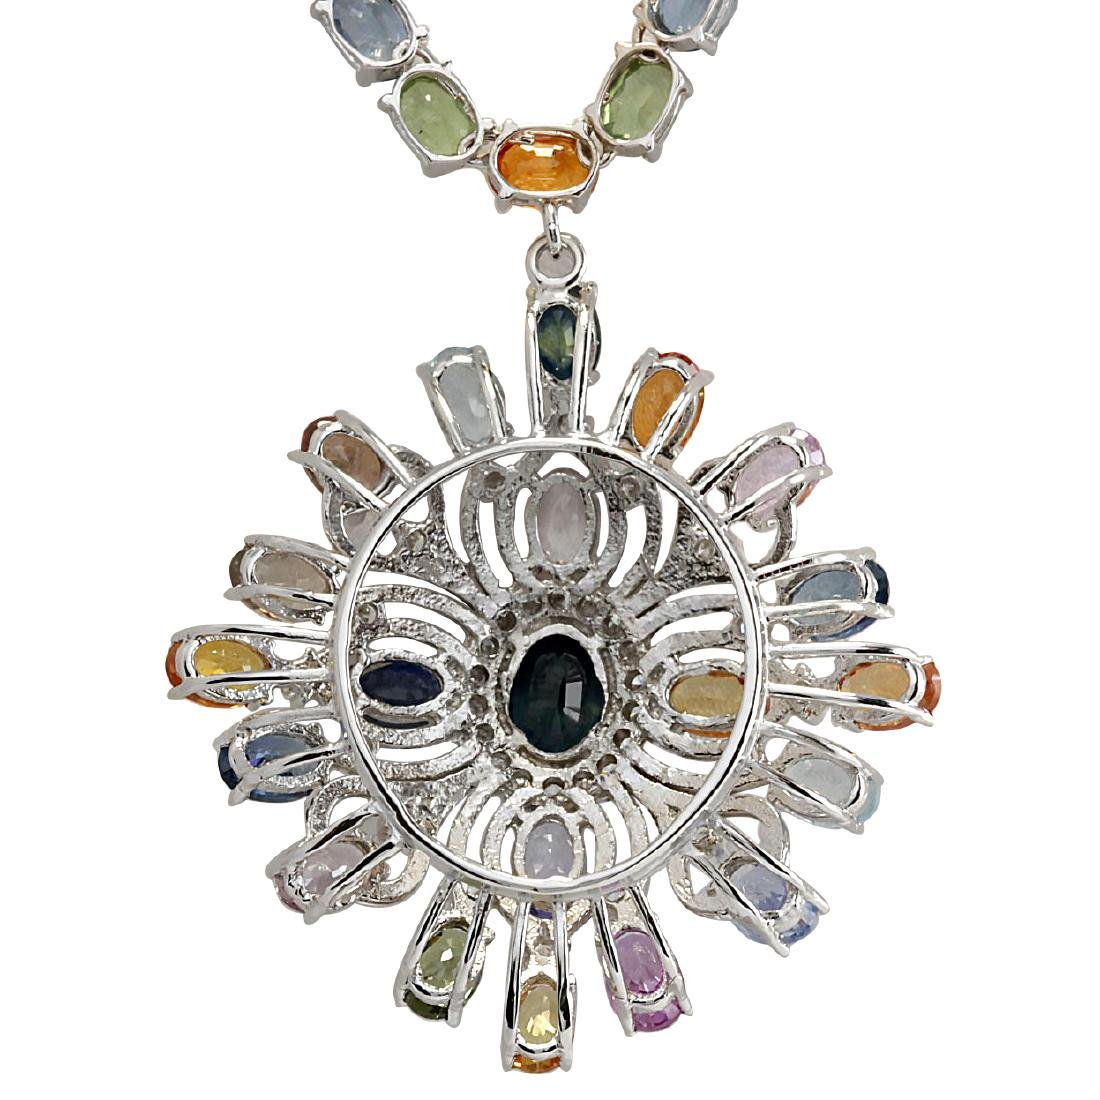 52.90CTW Natural Ceylon Sapphire And Diamond Necklace - 2